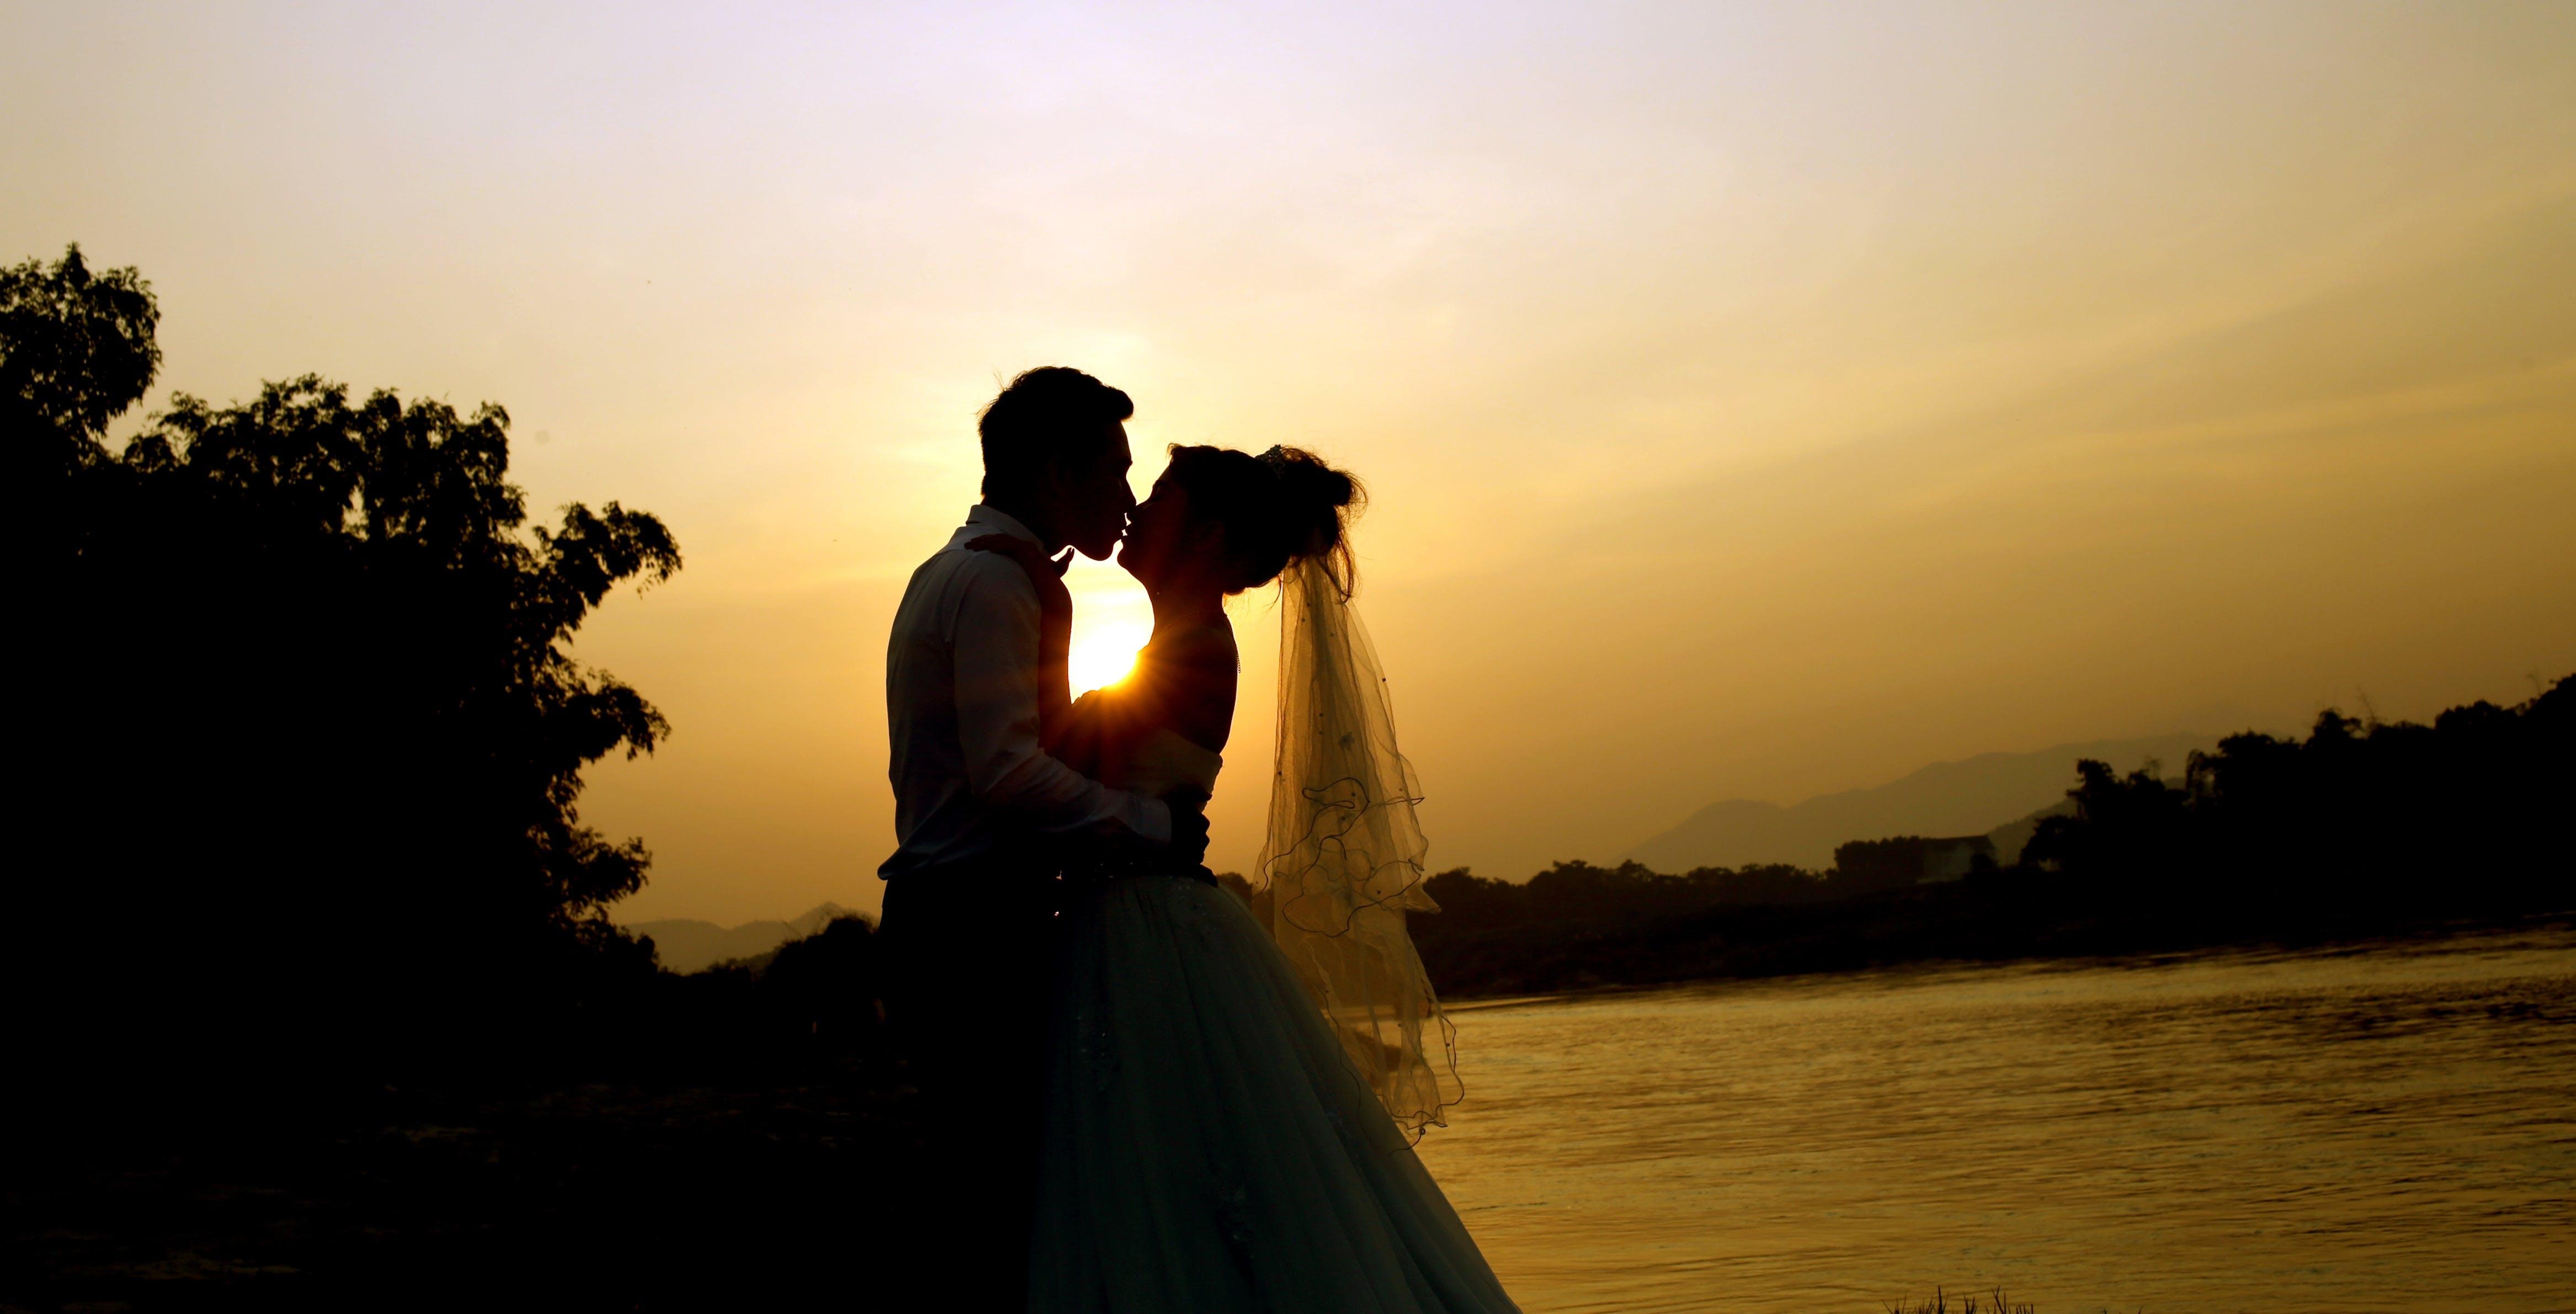 adult, beach, bride